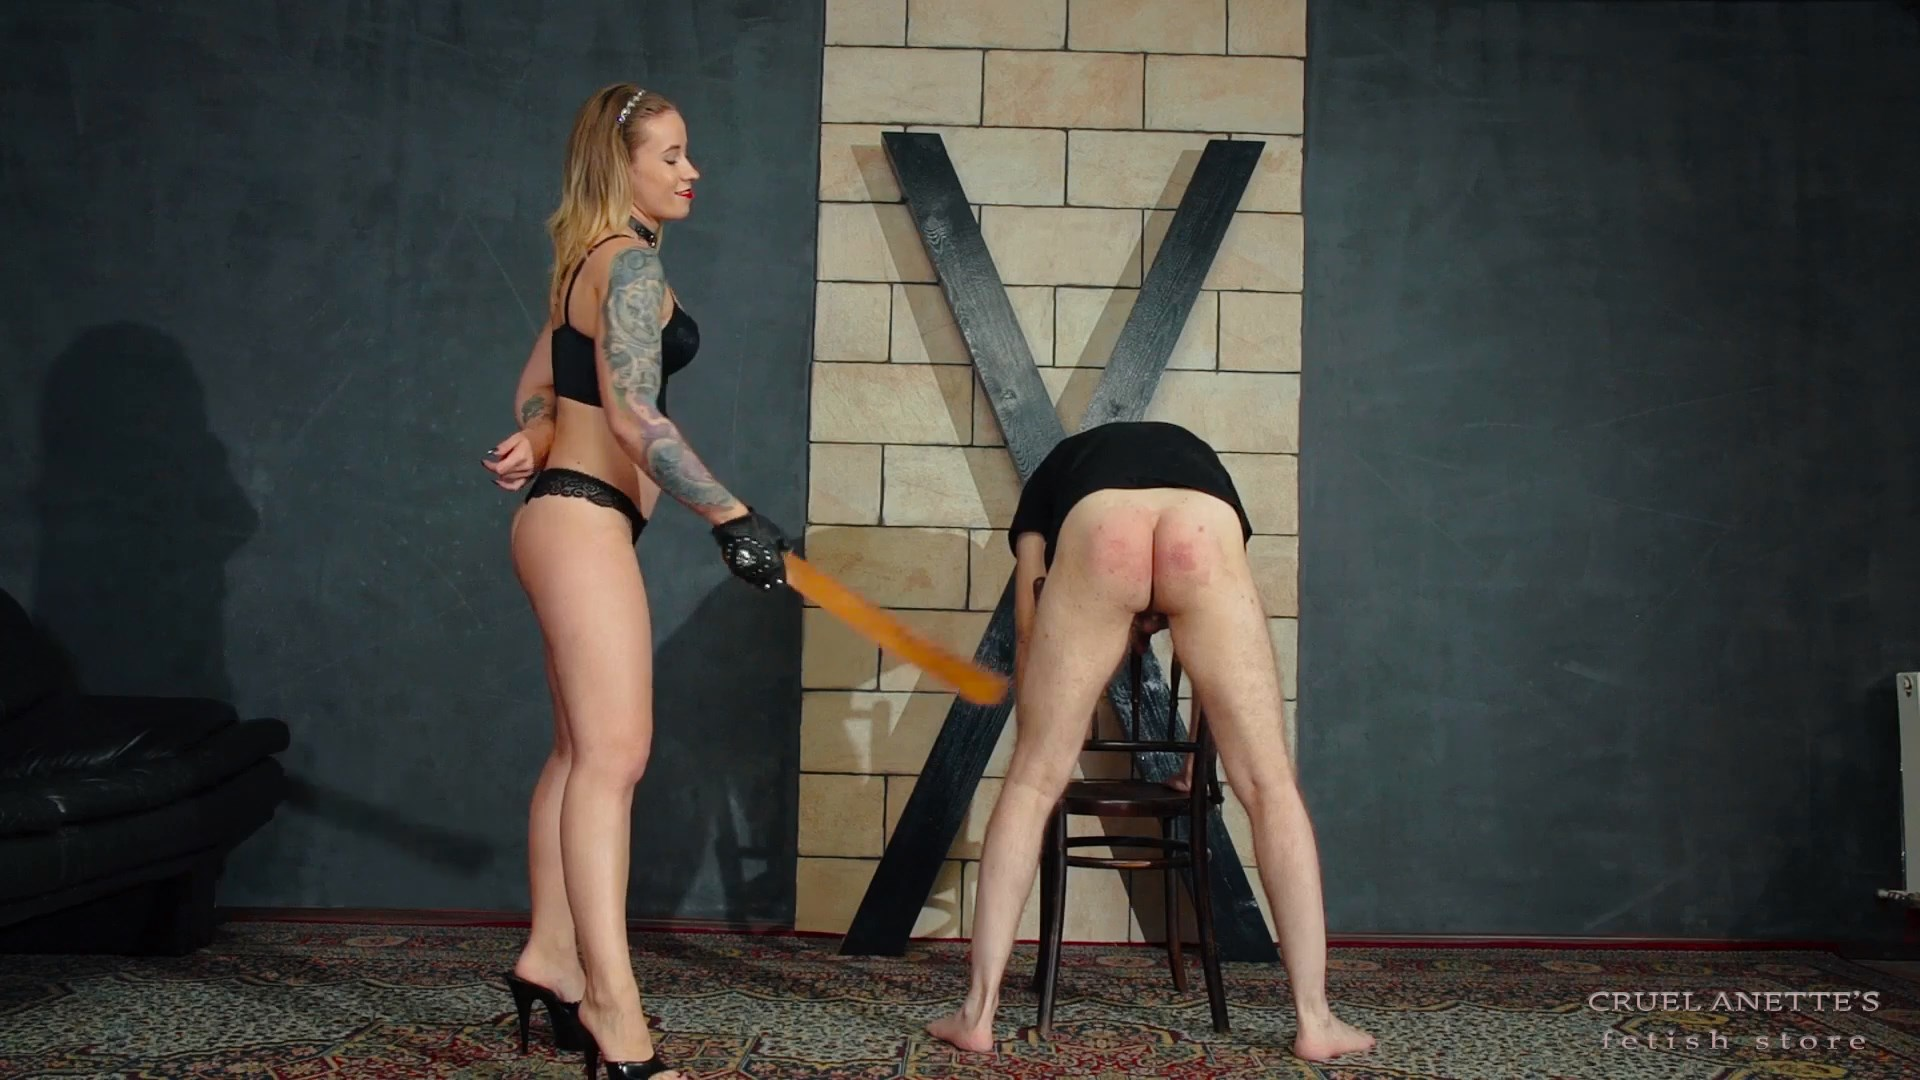 Vicious spanking - CRUEL ANETTES FETISH STORE - FULL HD/1080p/MP4